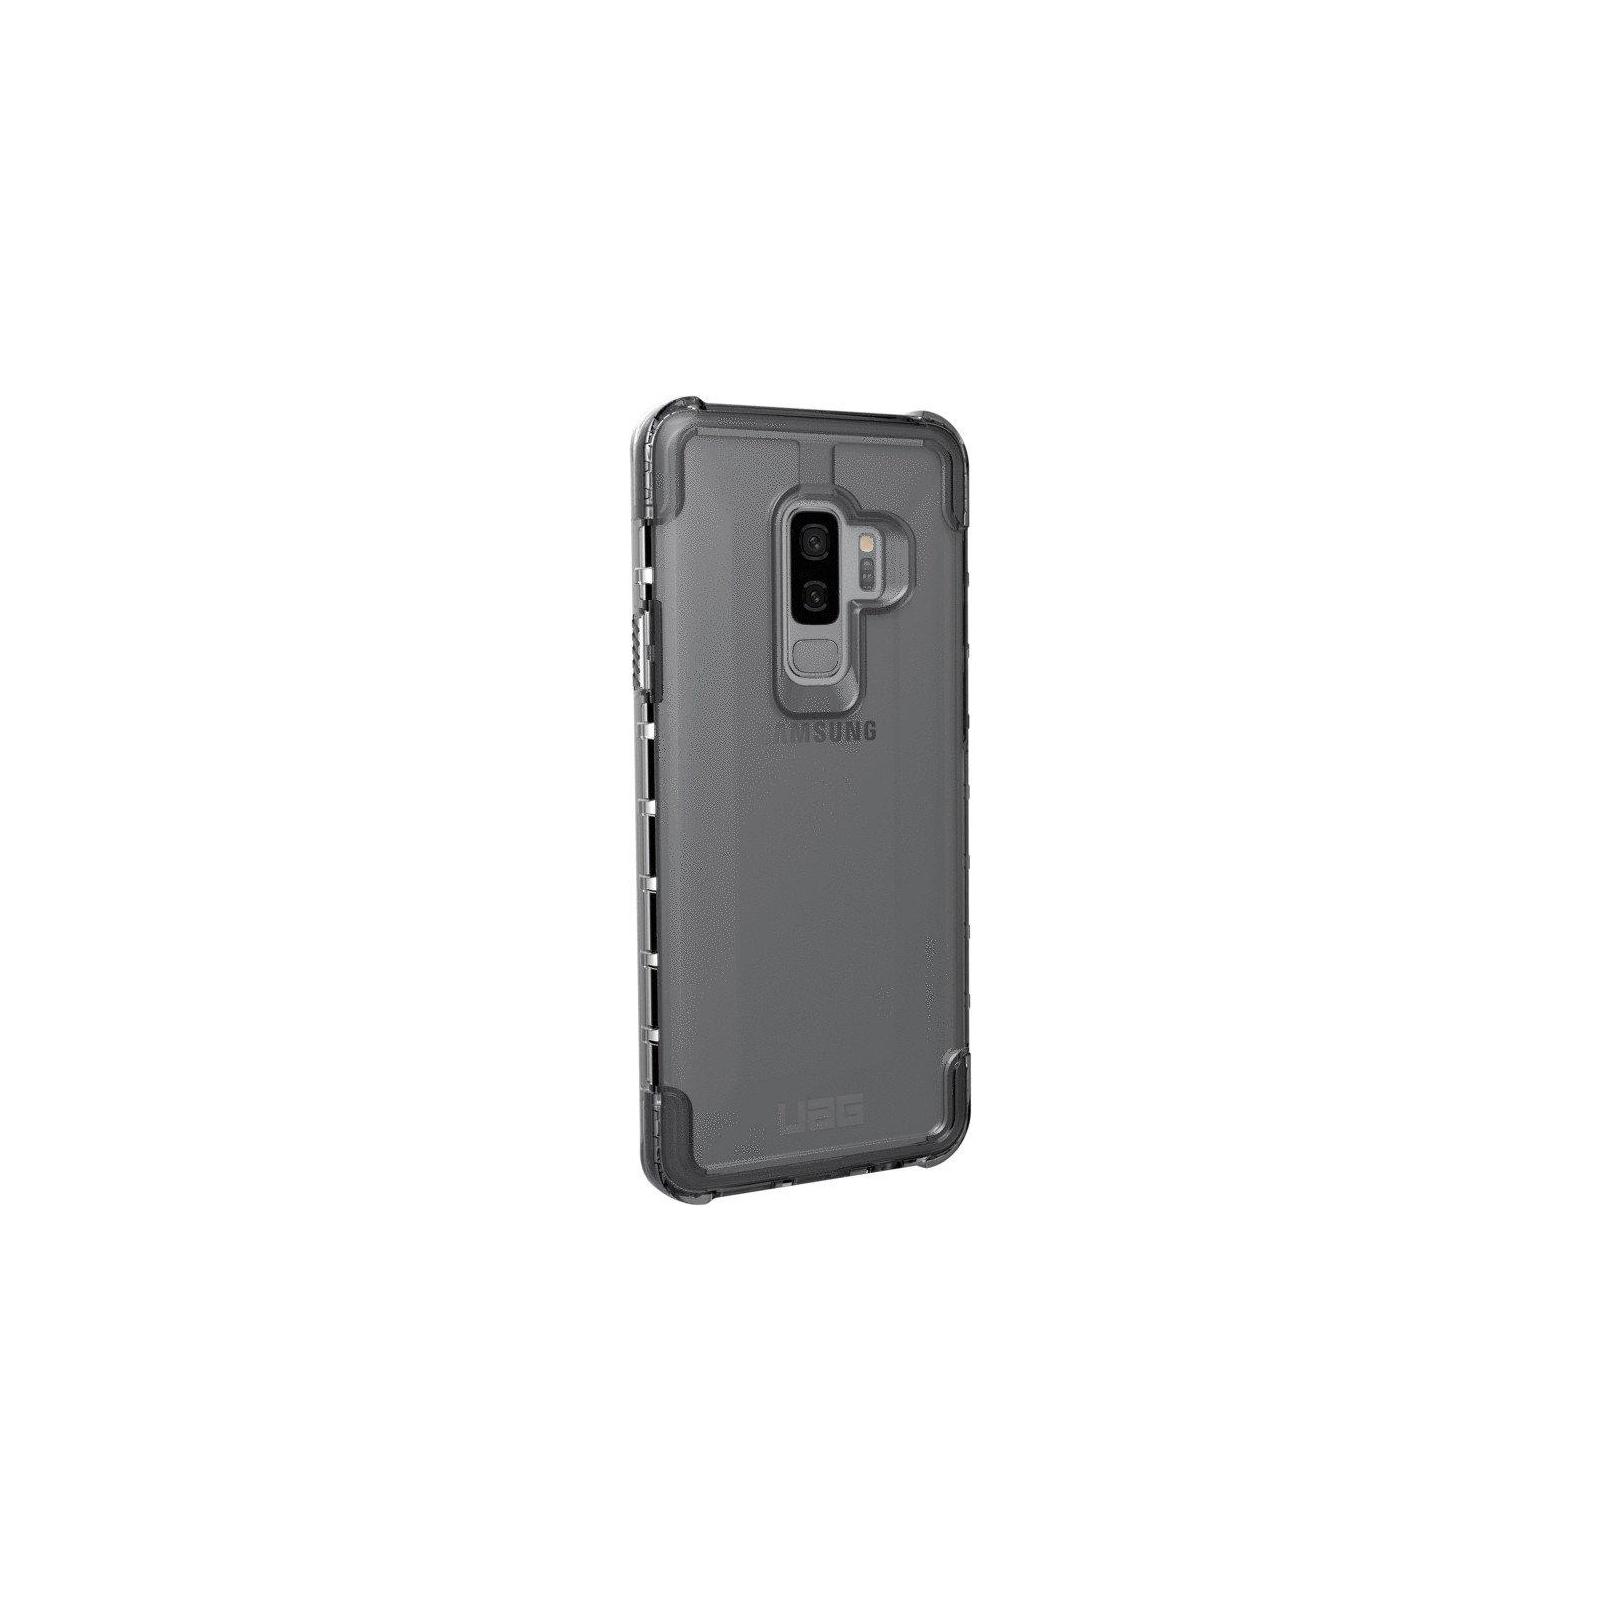 Чехол для моб. телефона UAG Galaxy S9+ Plyo Ice (GLXS9PLS-Y-IC) изображение 4